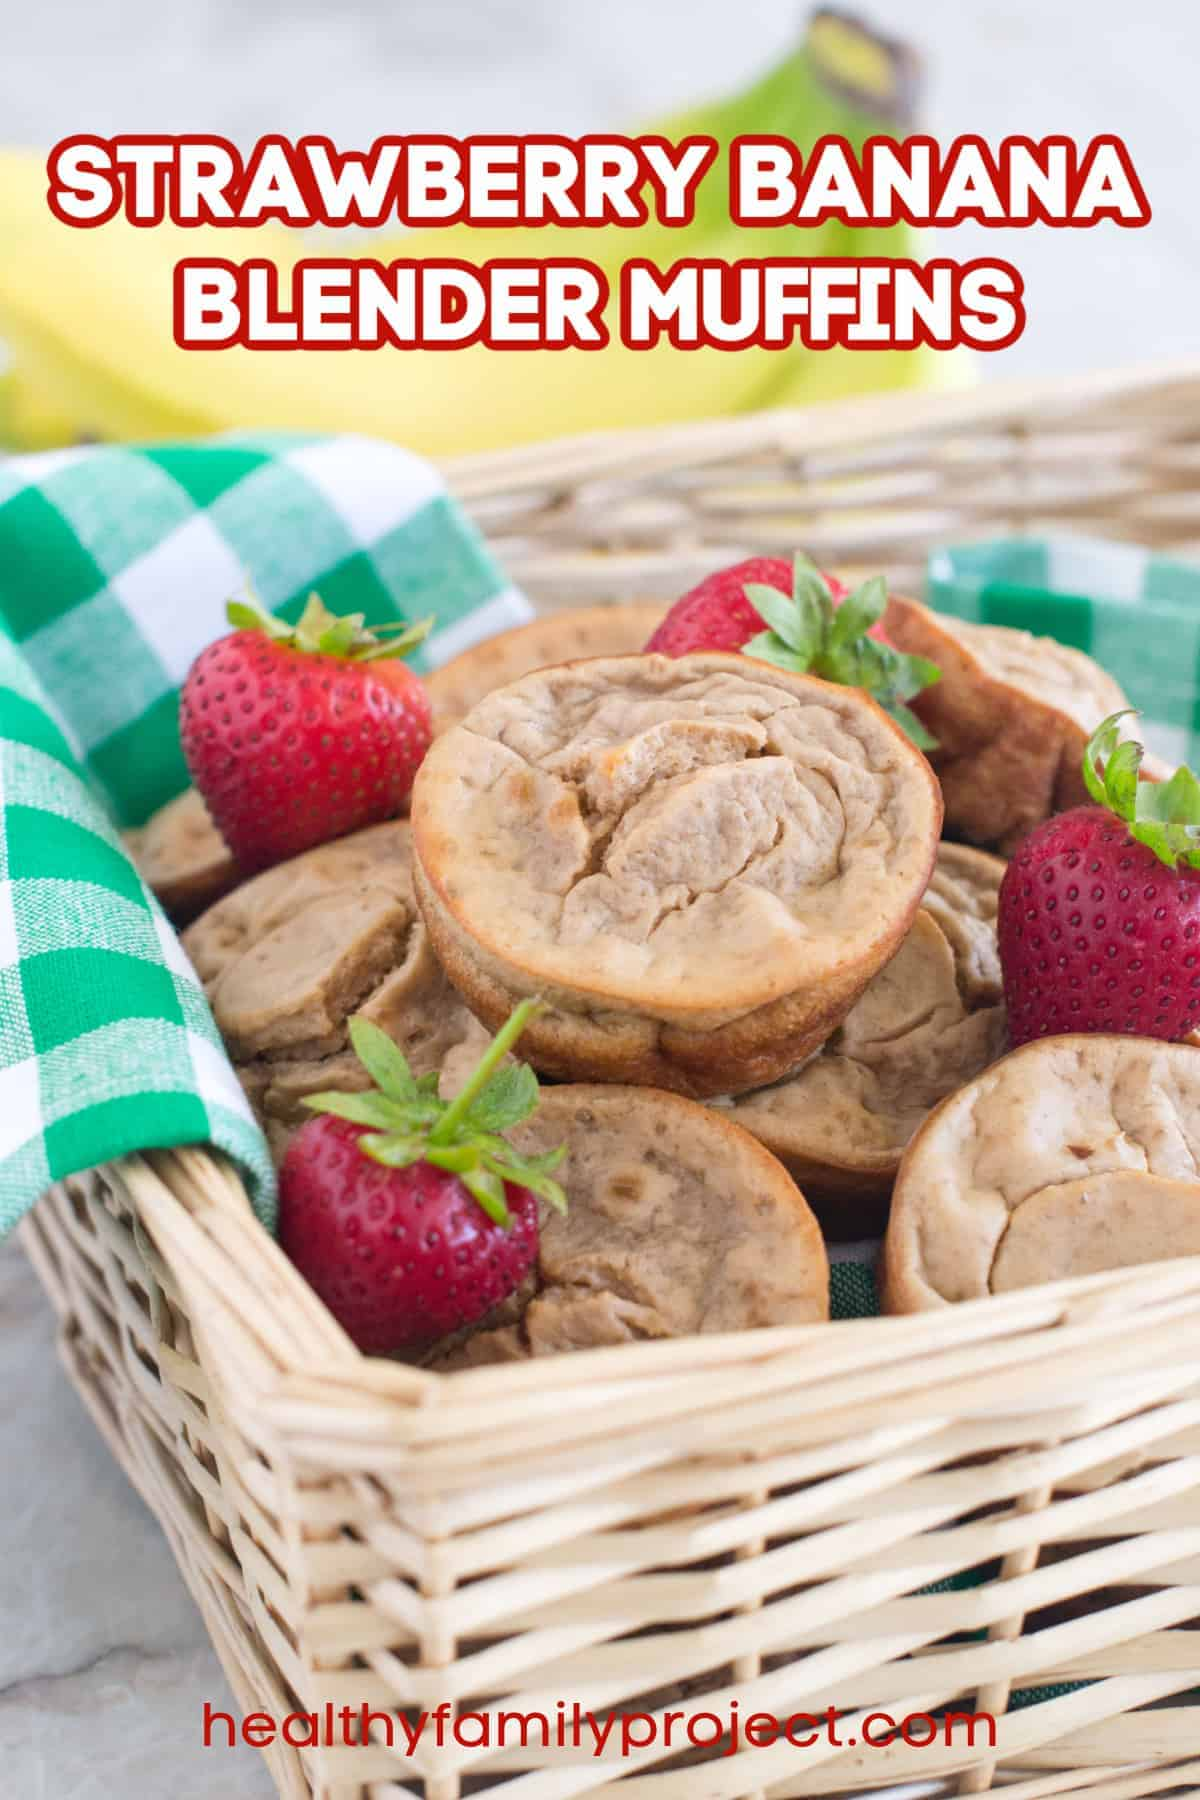 How To Make Strawberry Banana Blender Muffins